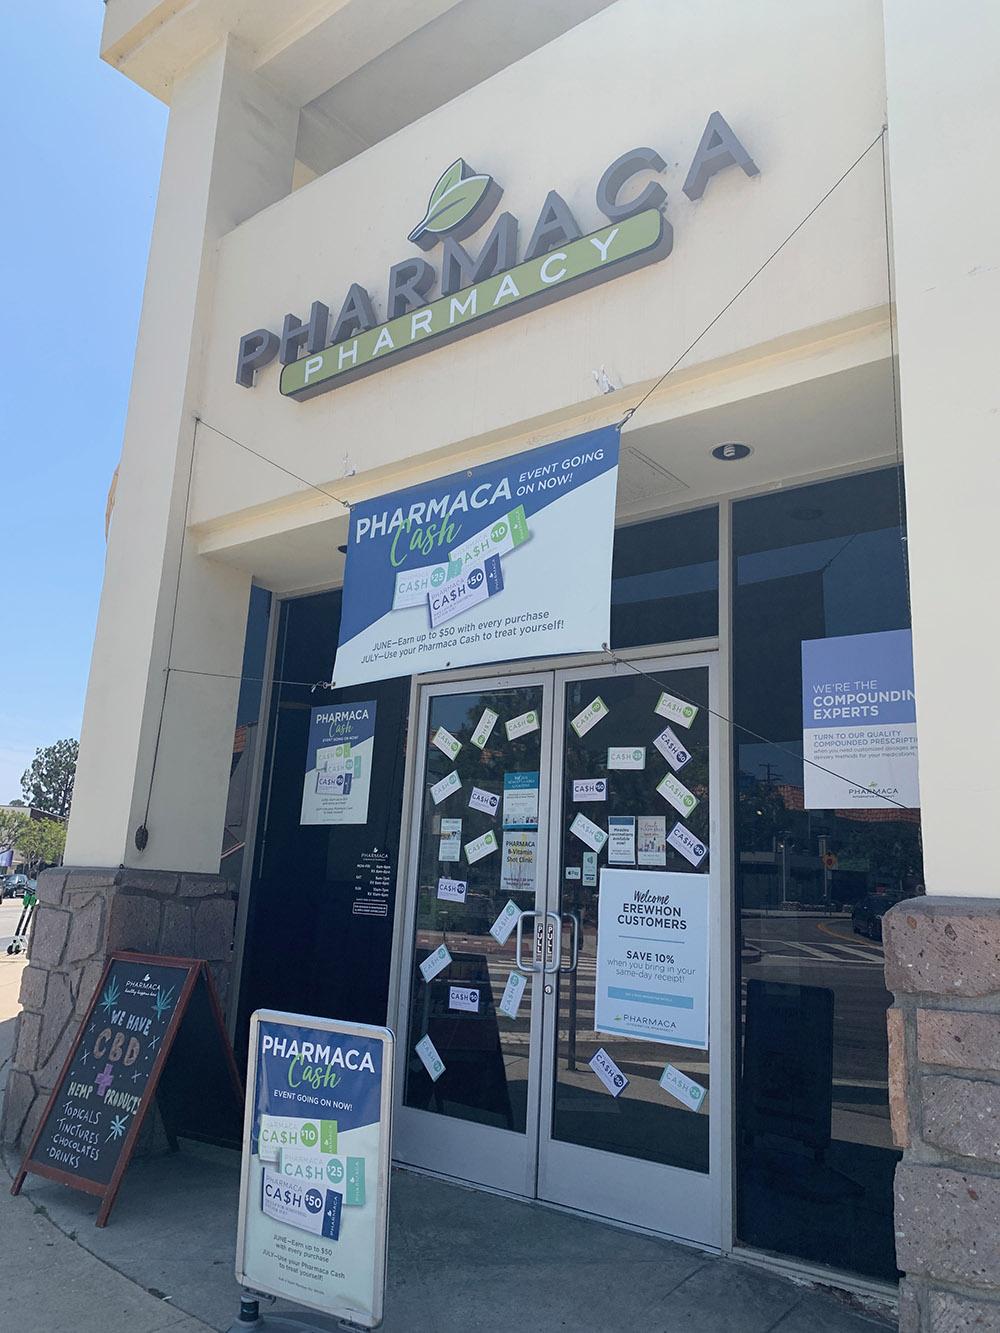 Jurlique Skin Studio is located inside Pharmaca in Pacific Palisades, California.